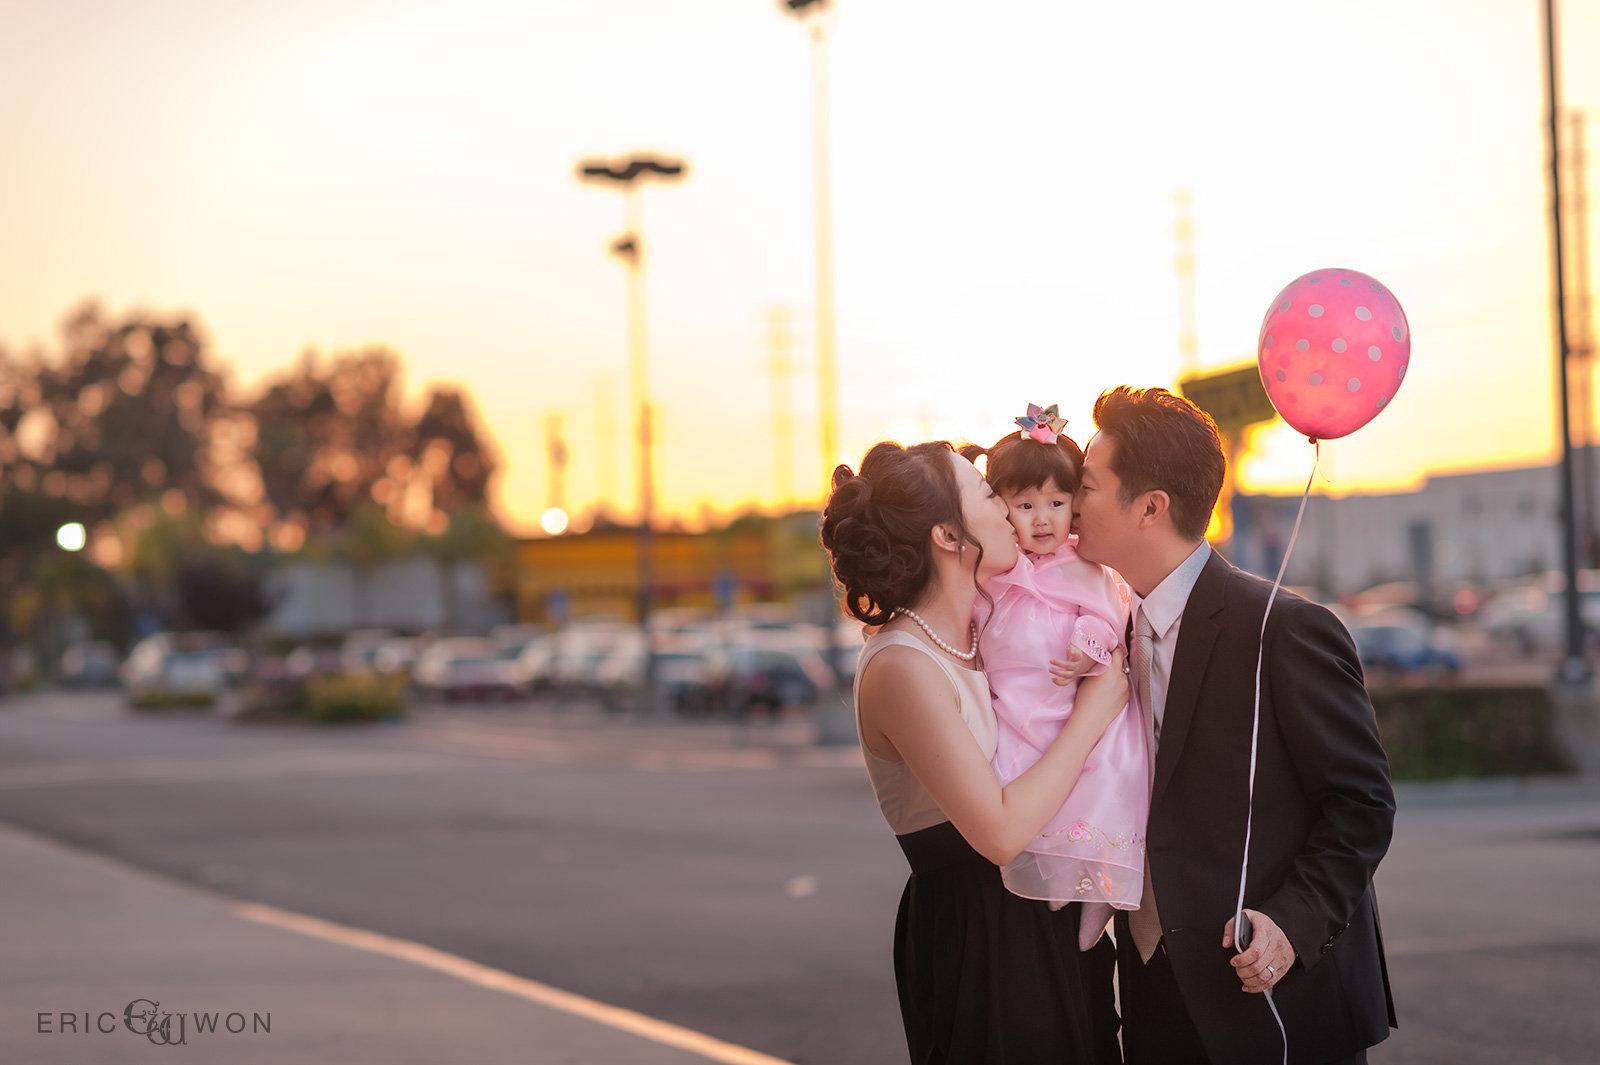 Baby Snap (1st anniversary)